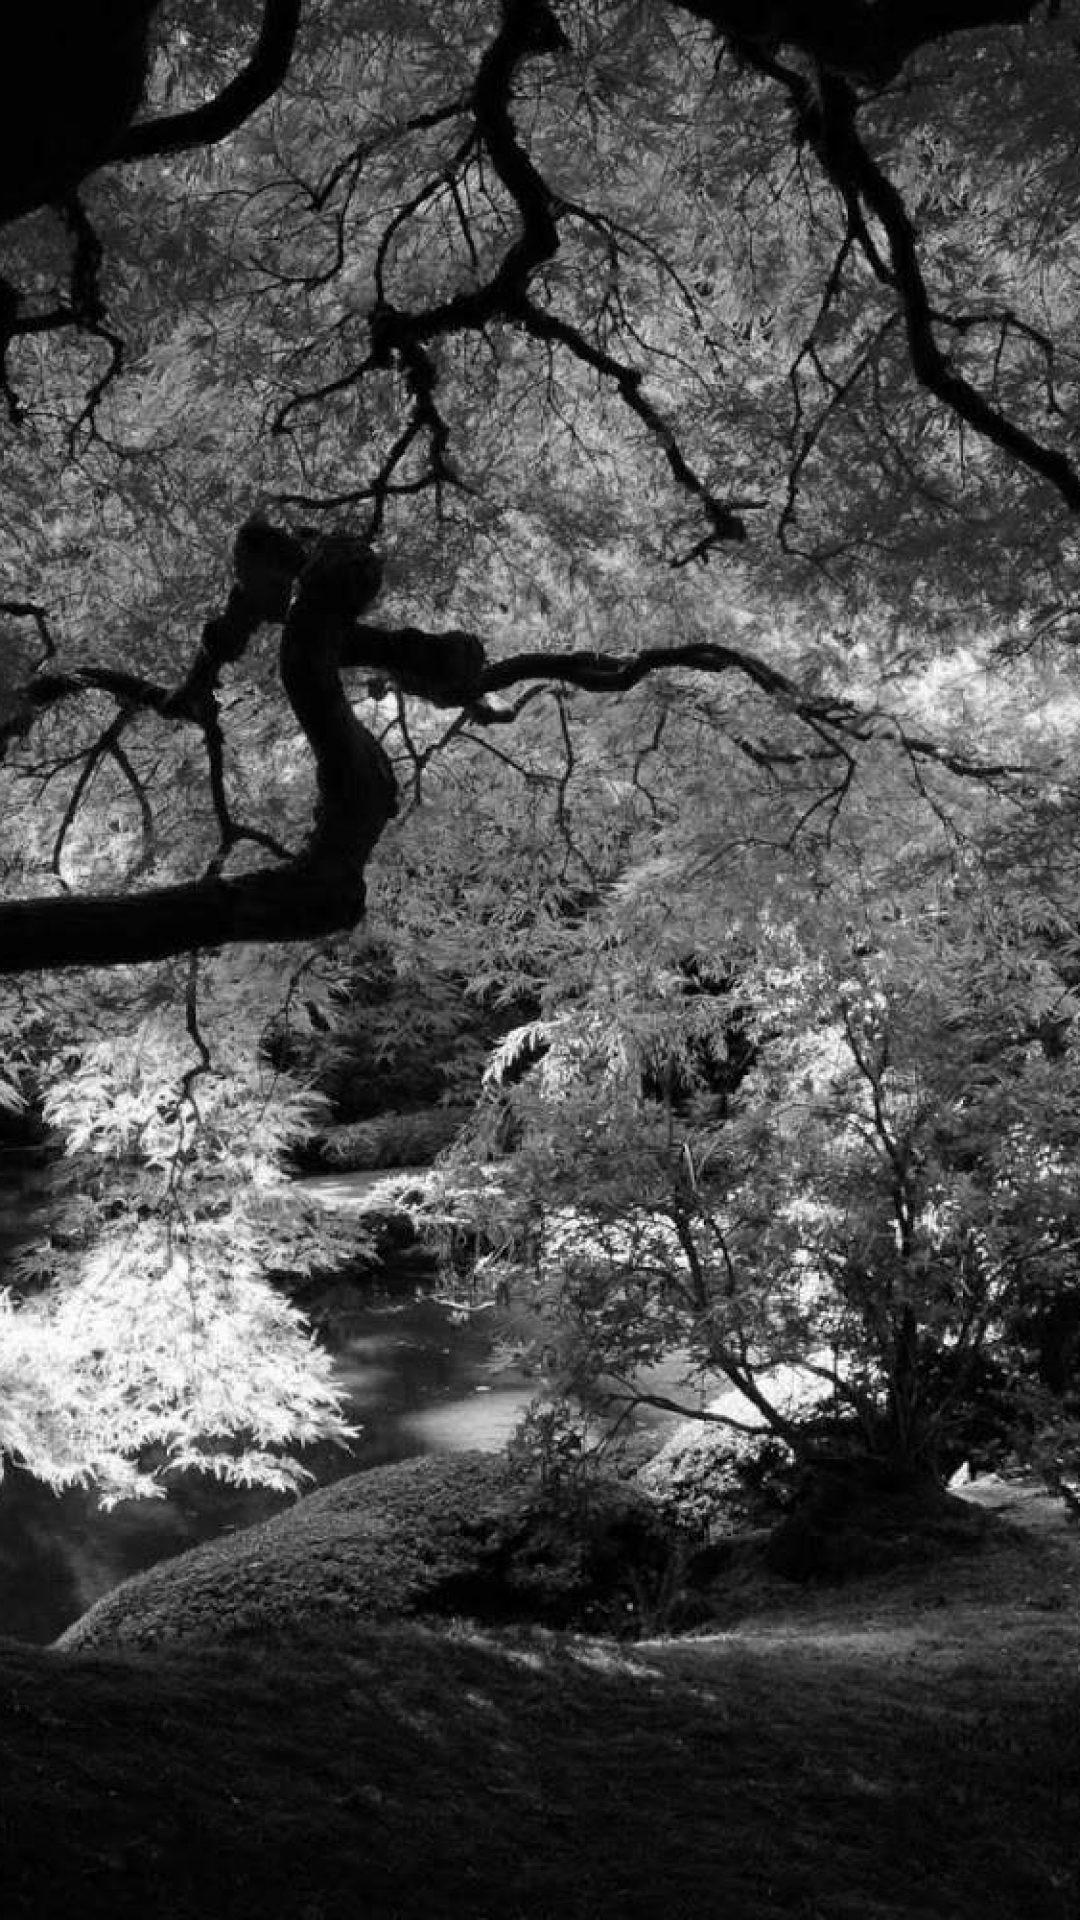 Black And White Nature Wallpaper